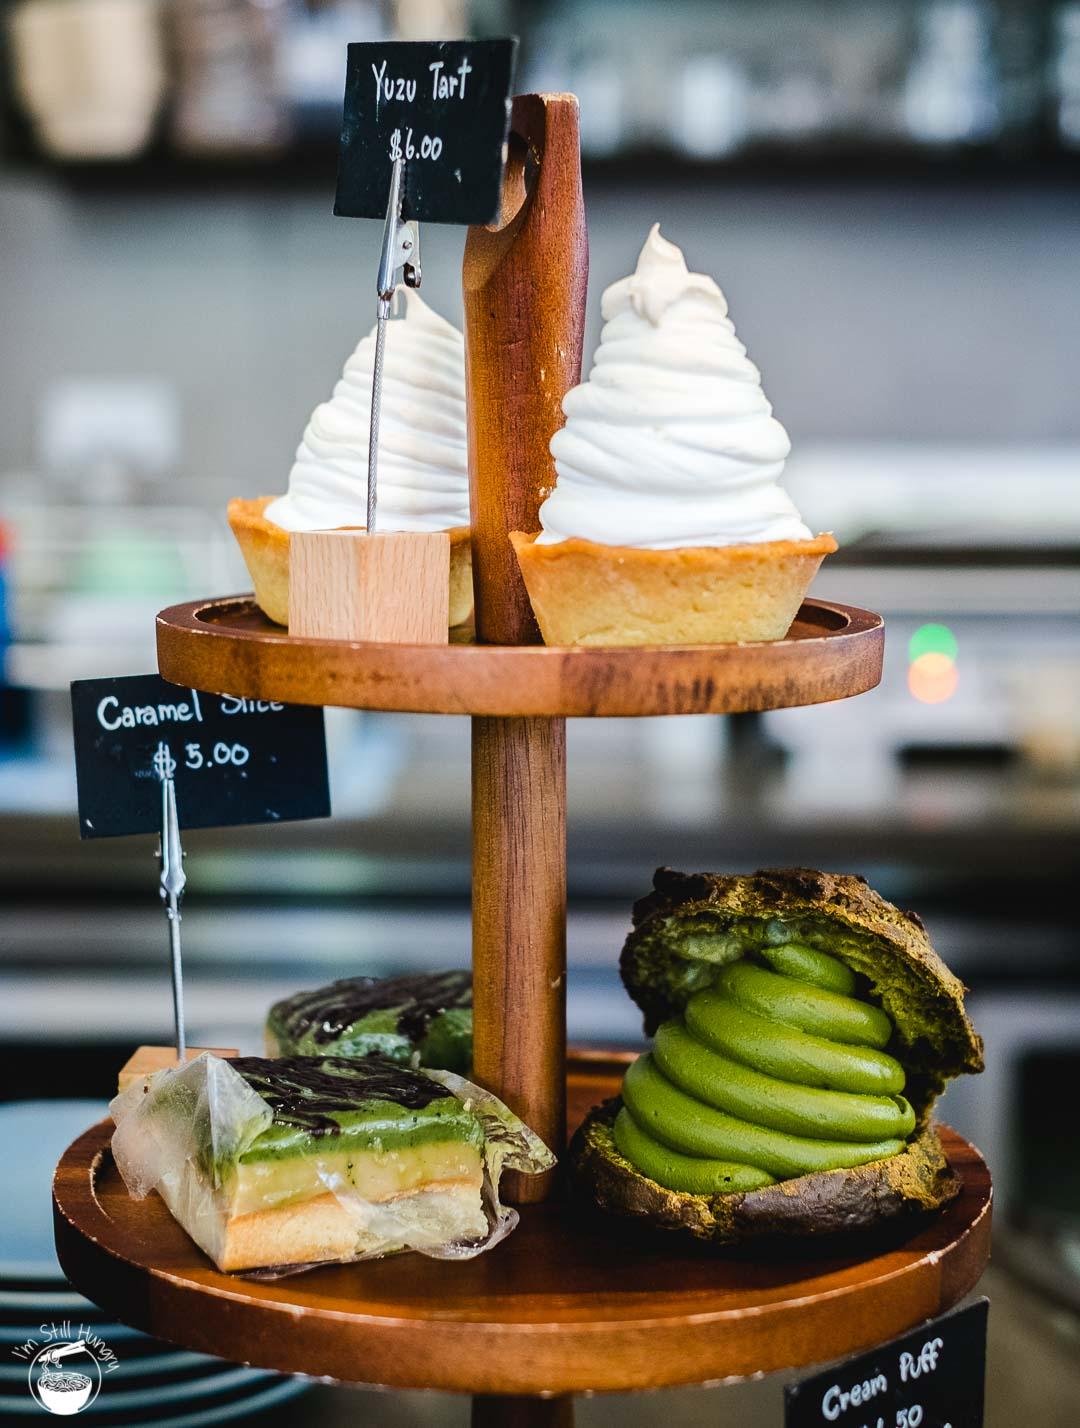 Cafe Kentaro Surry Hills desserts